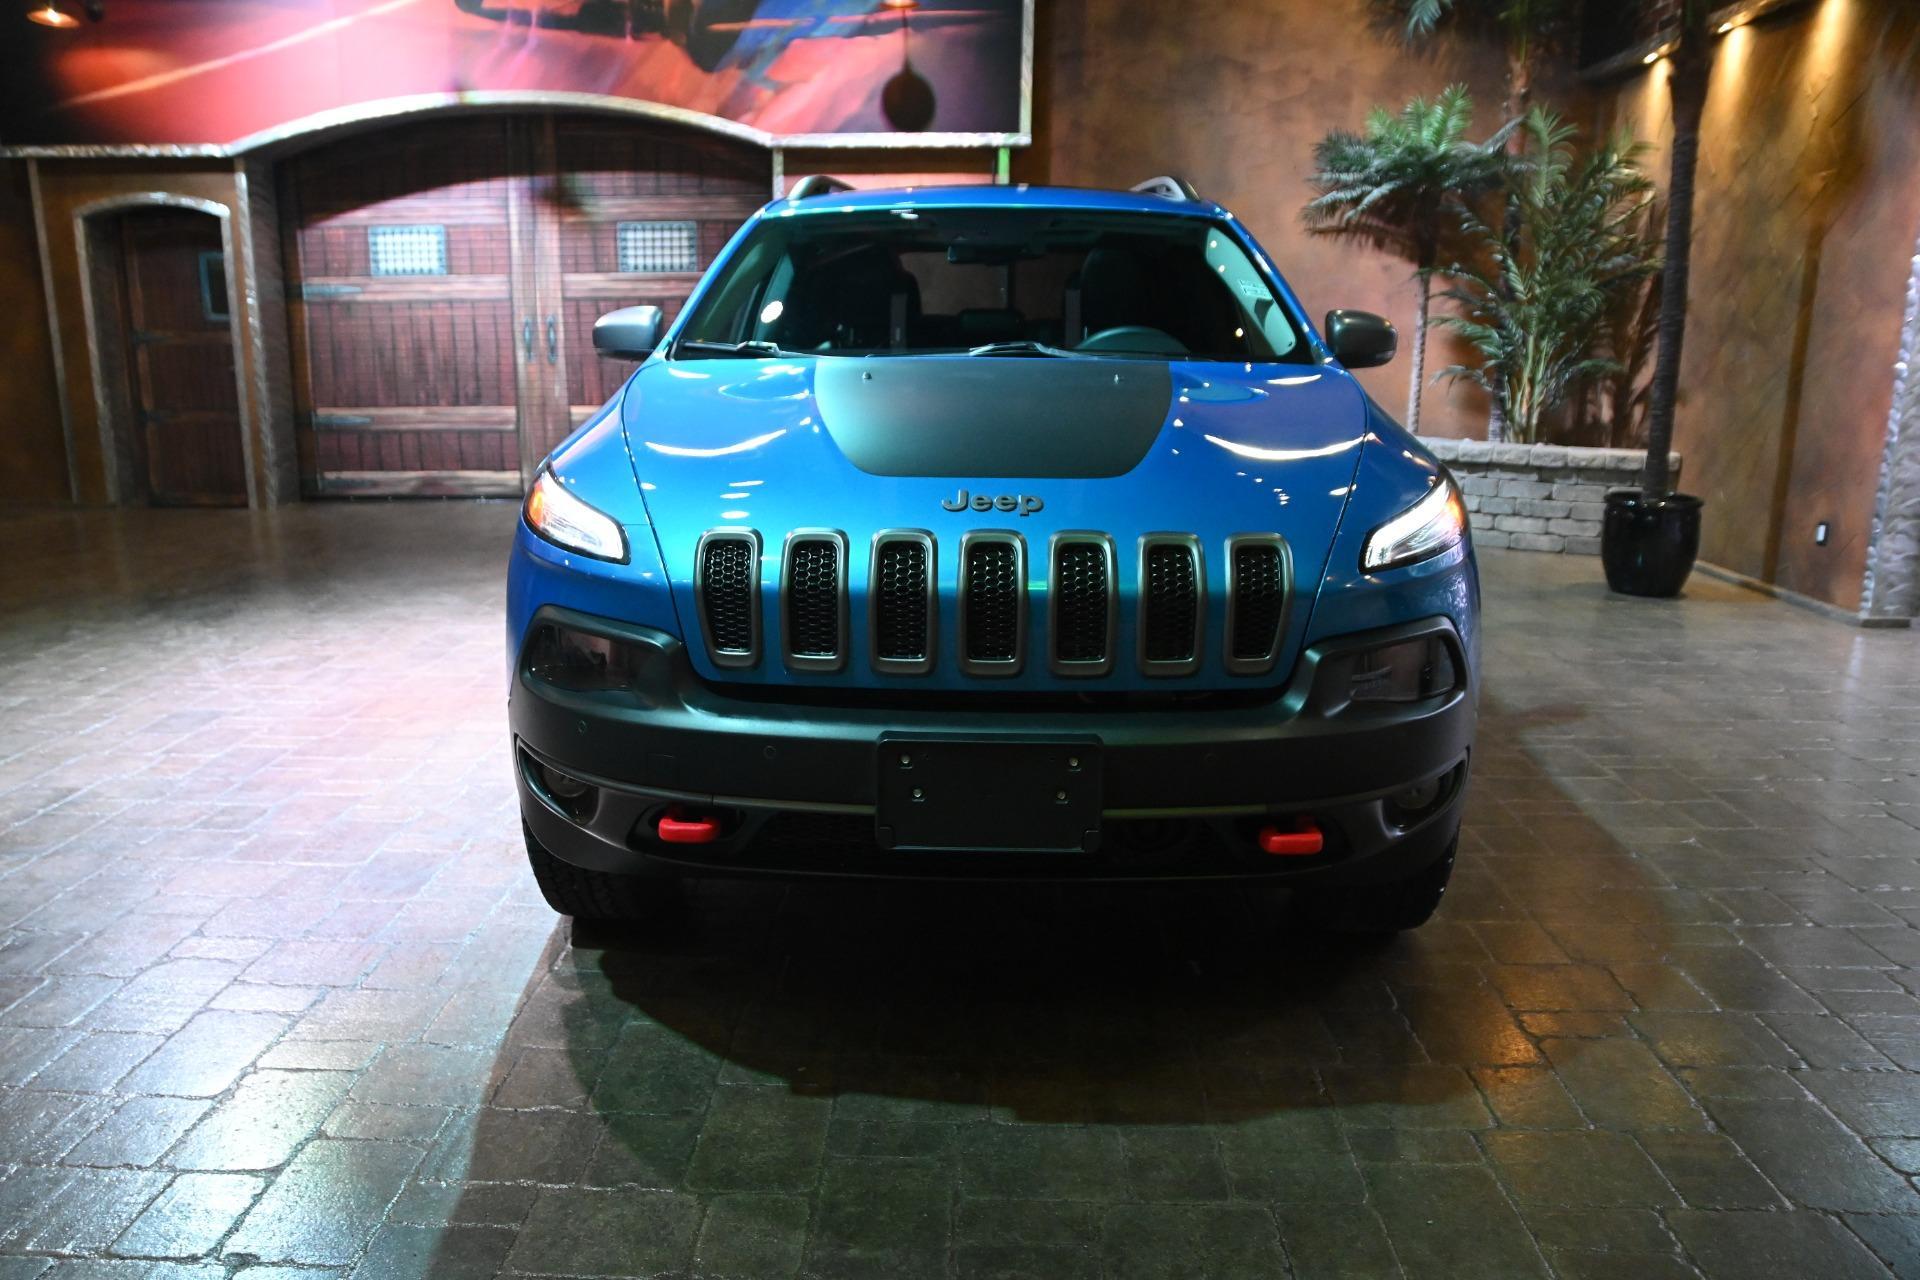 2018 Jeep Cherokee, used, $34,600 | VIN 1C4PJMBXXJD549079 ...